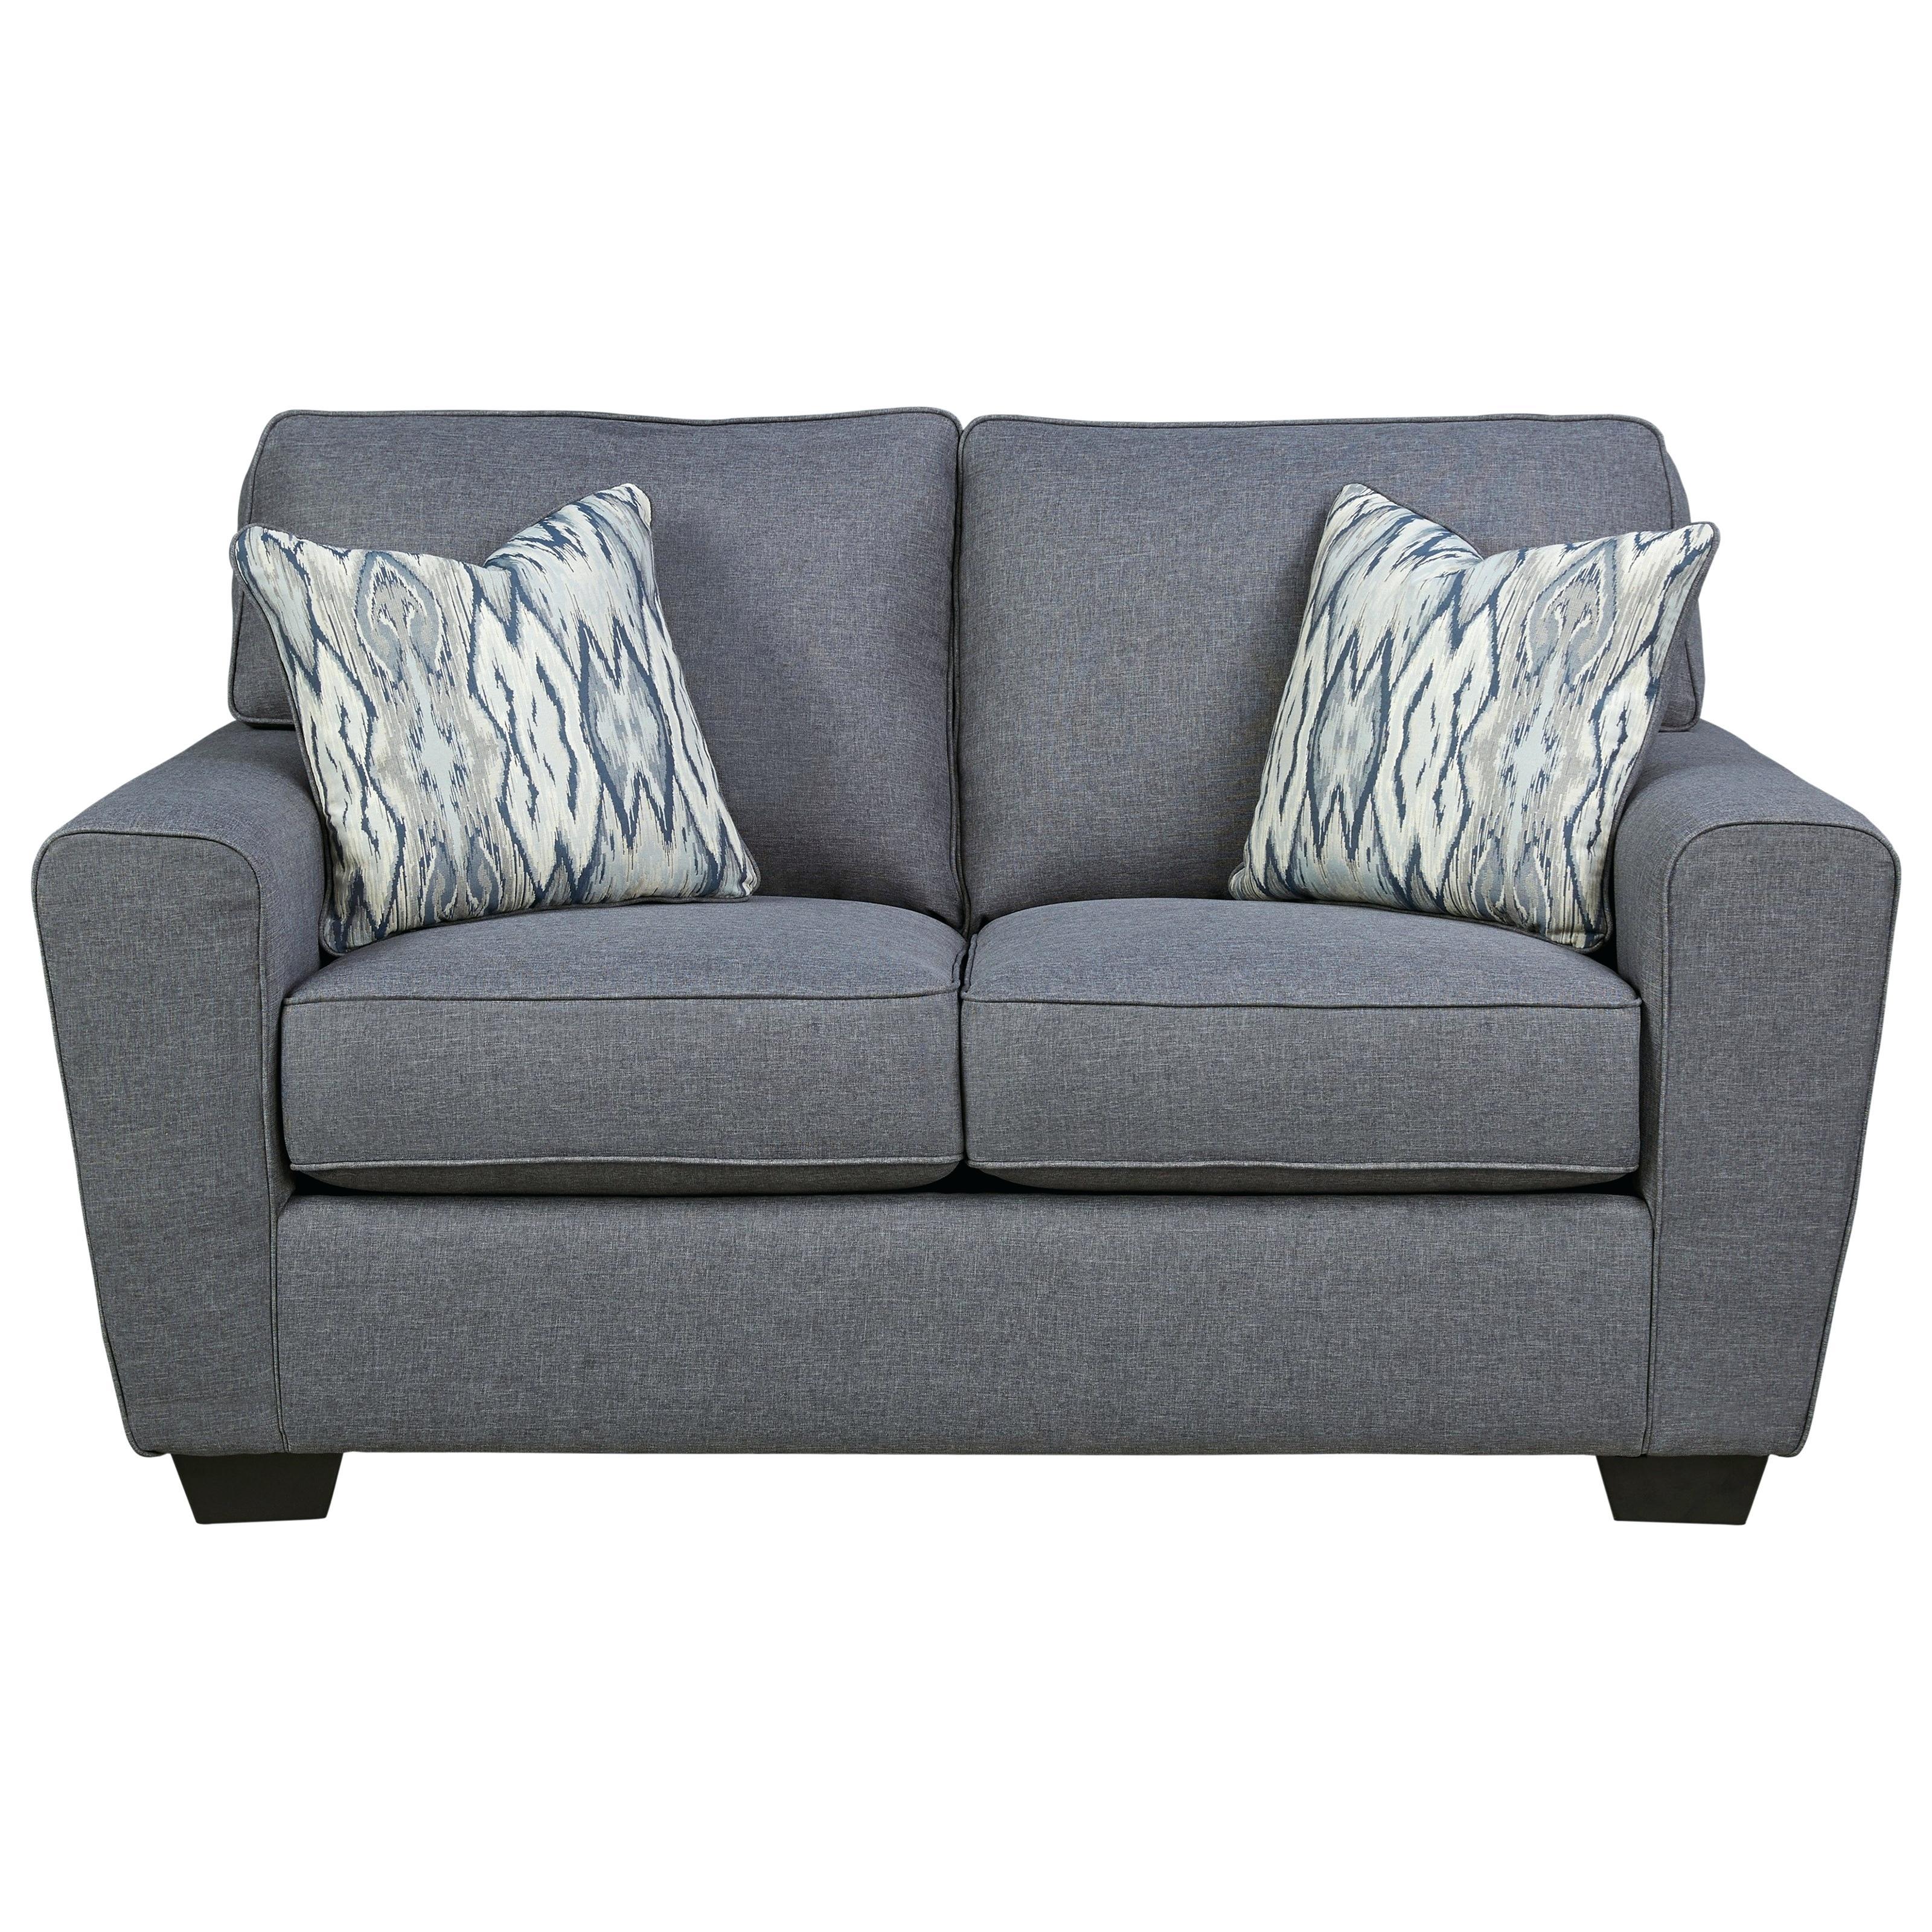 ashley furniture williston vt furniture contemporary ashley furniture warehouse williston vt